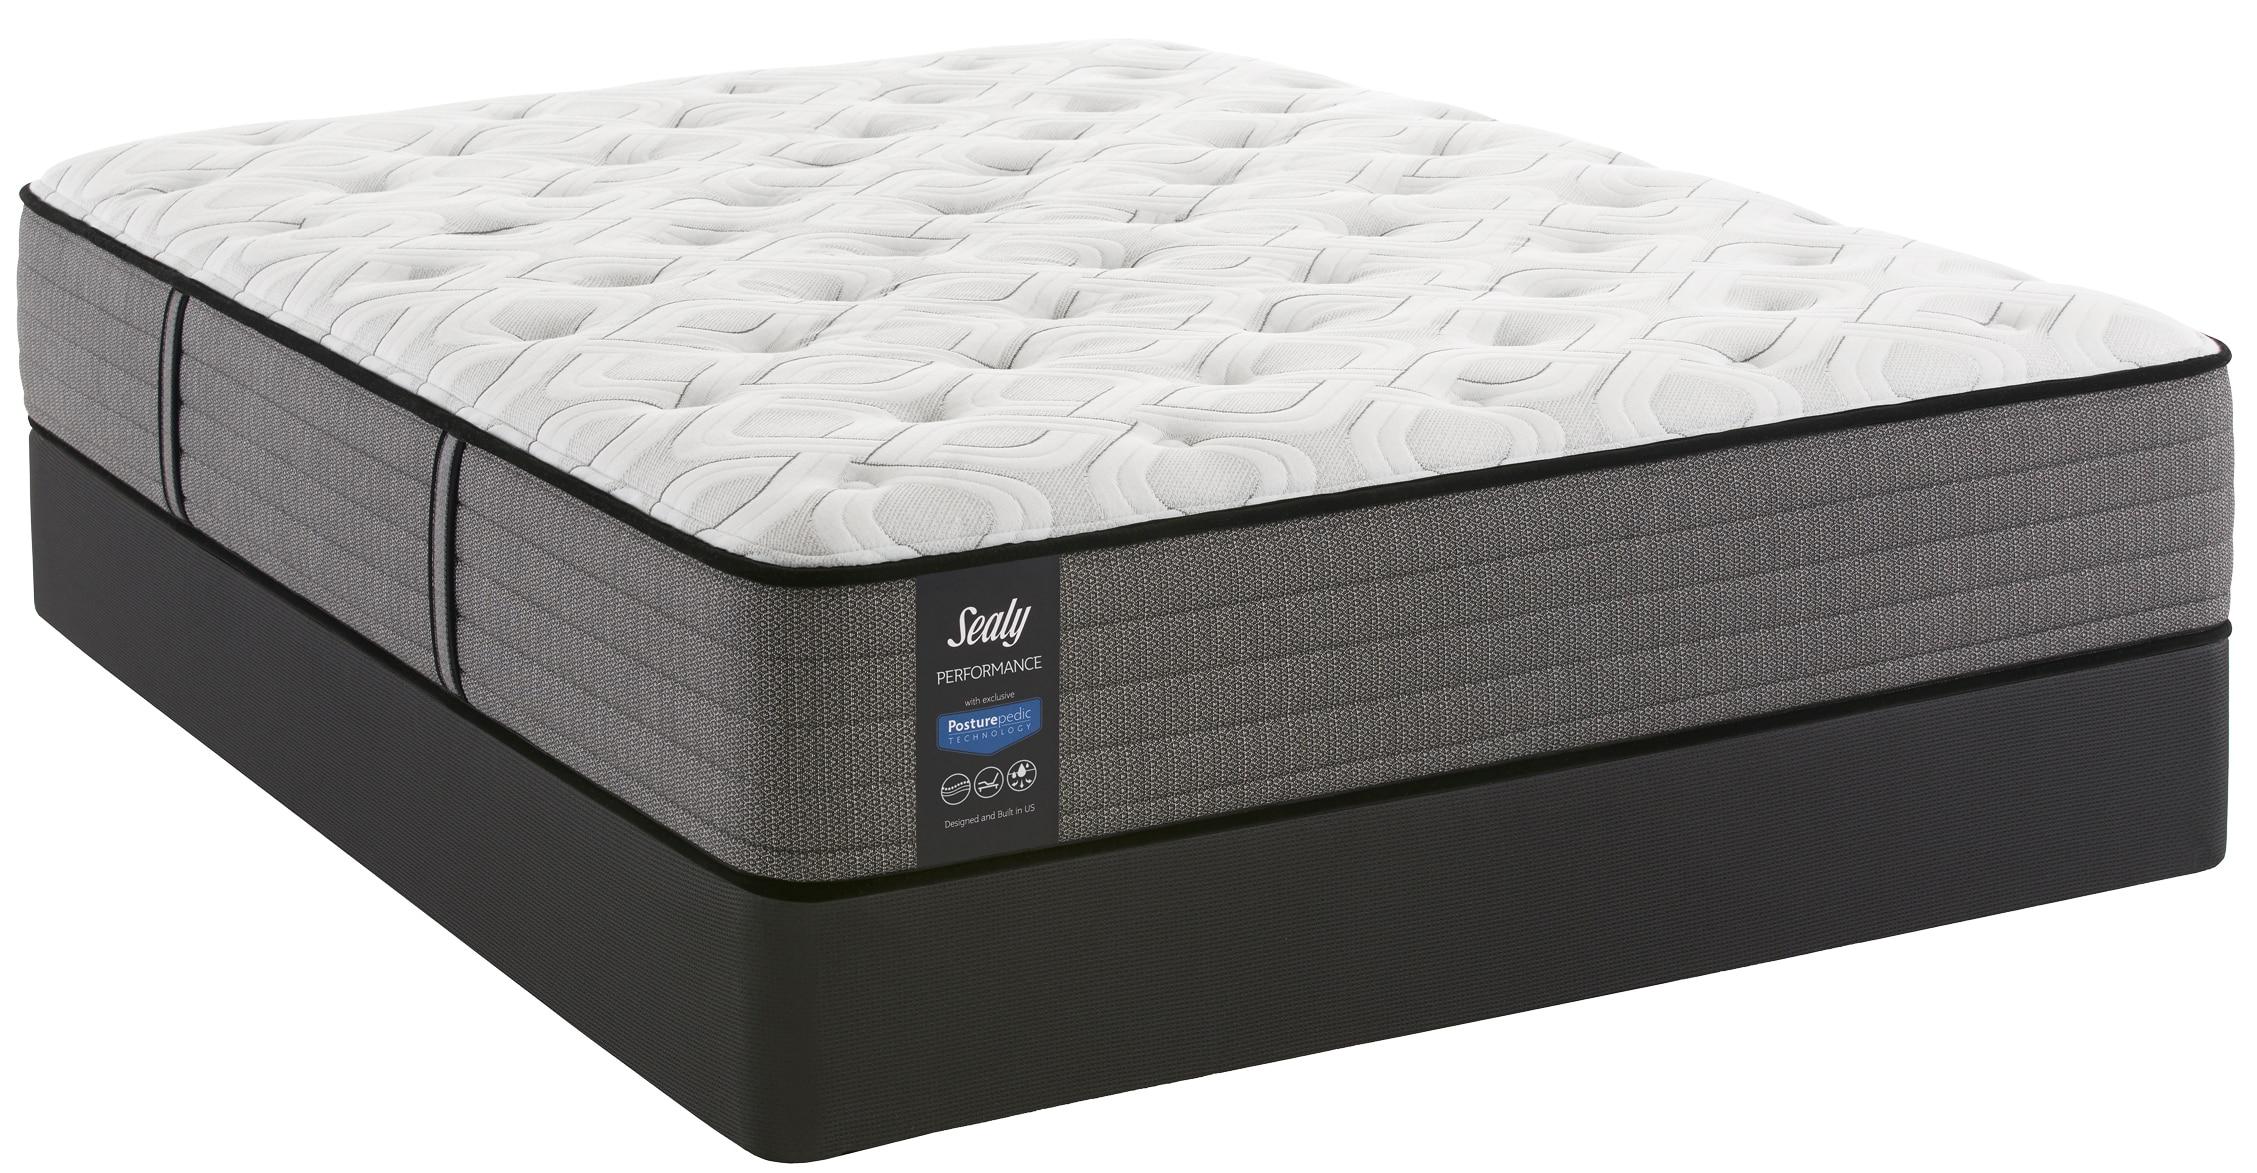 Morning Dove Cushion Firm Full XL Mattress and Boxspring Set